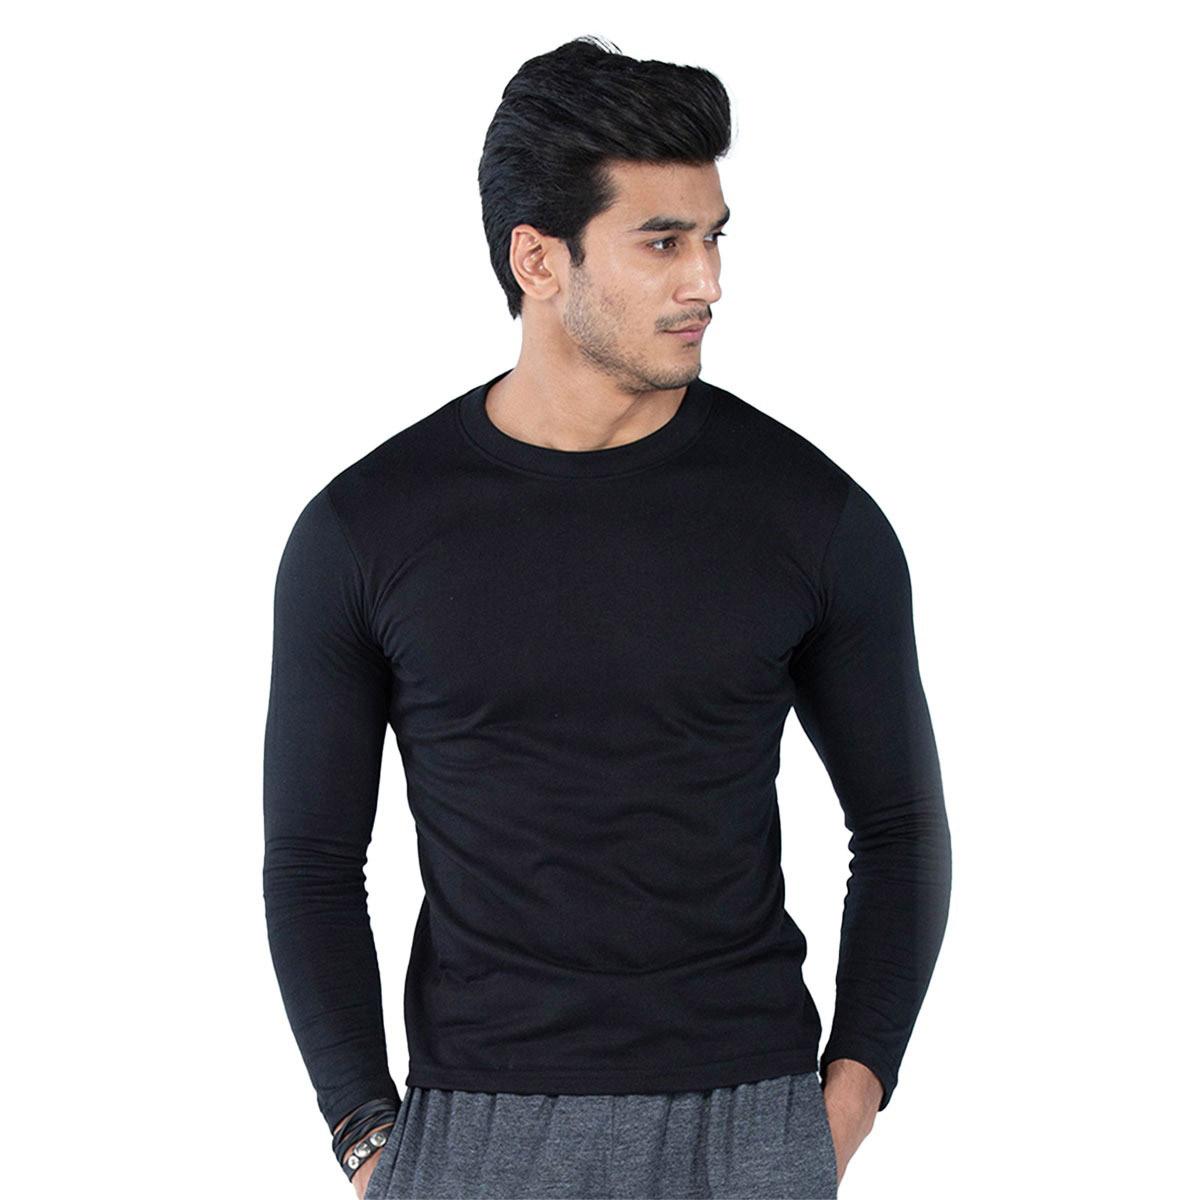 Select by  Basic Round Neck Full Sleeves T-Shirt For Men - Black